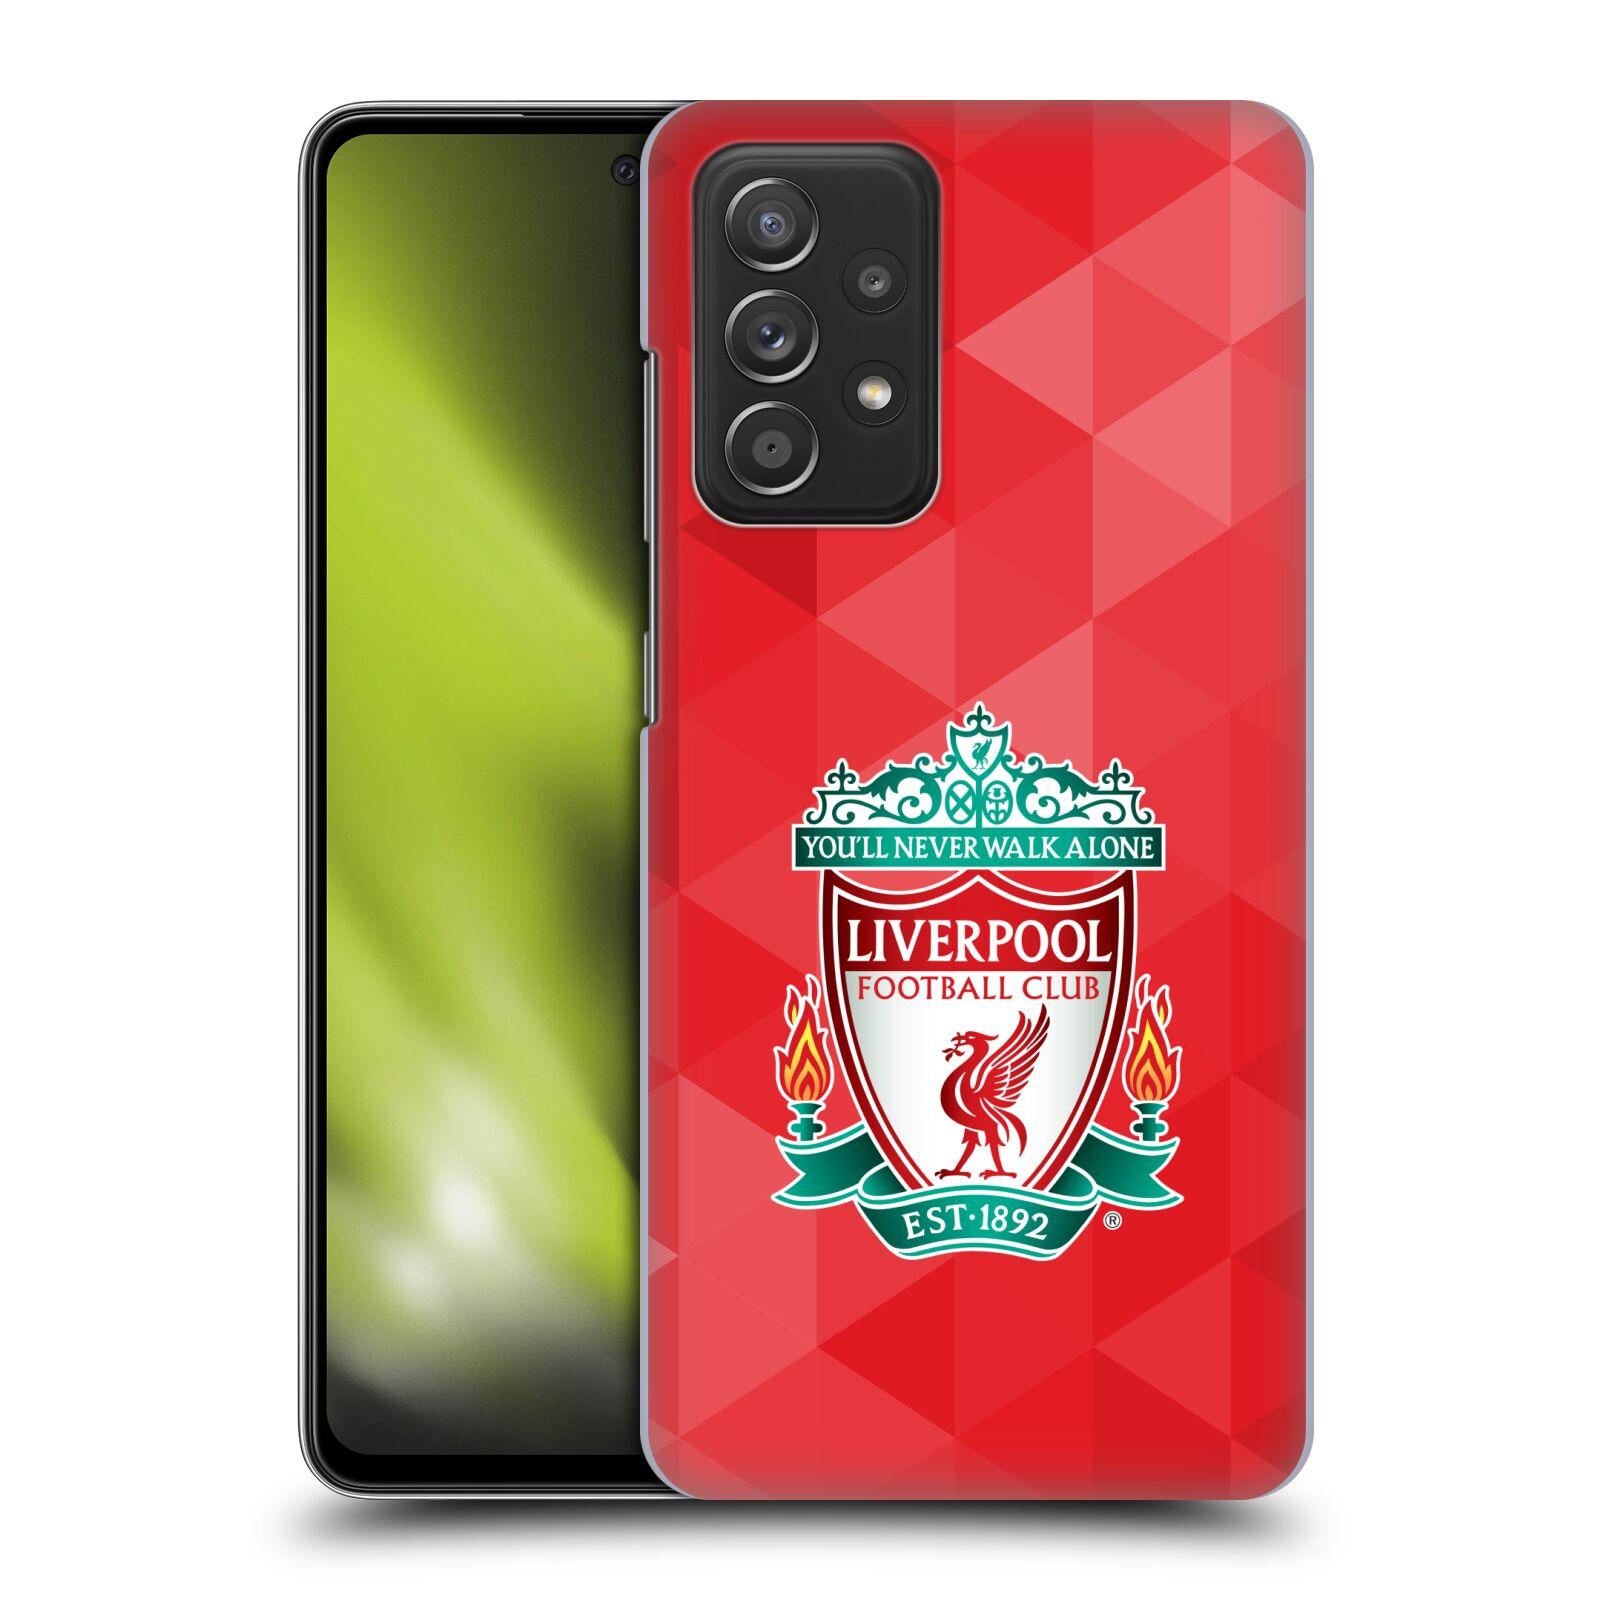 Plastové pouzdro na mobil Samsung Galaxy A52 / A52 5G / A52s 5G - Head Case - ZNAK LIVERPOOL FC OFFICIAL GEOMETRIC RED